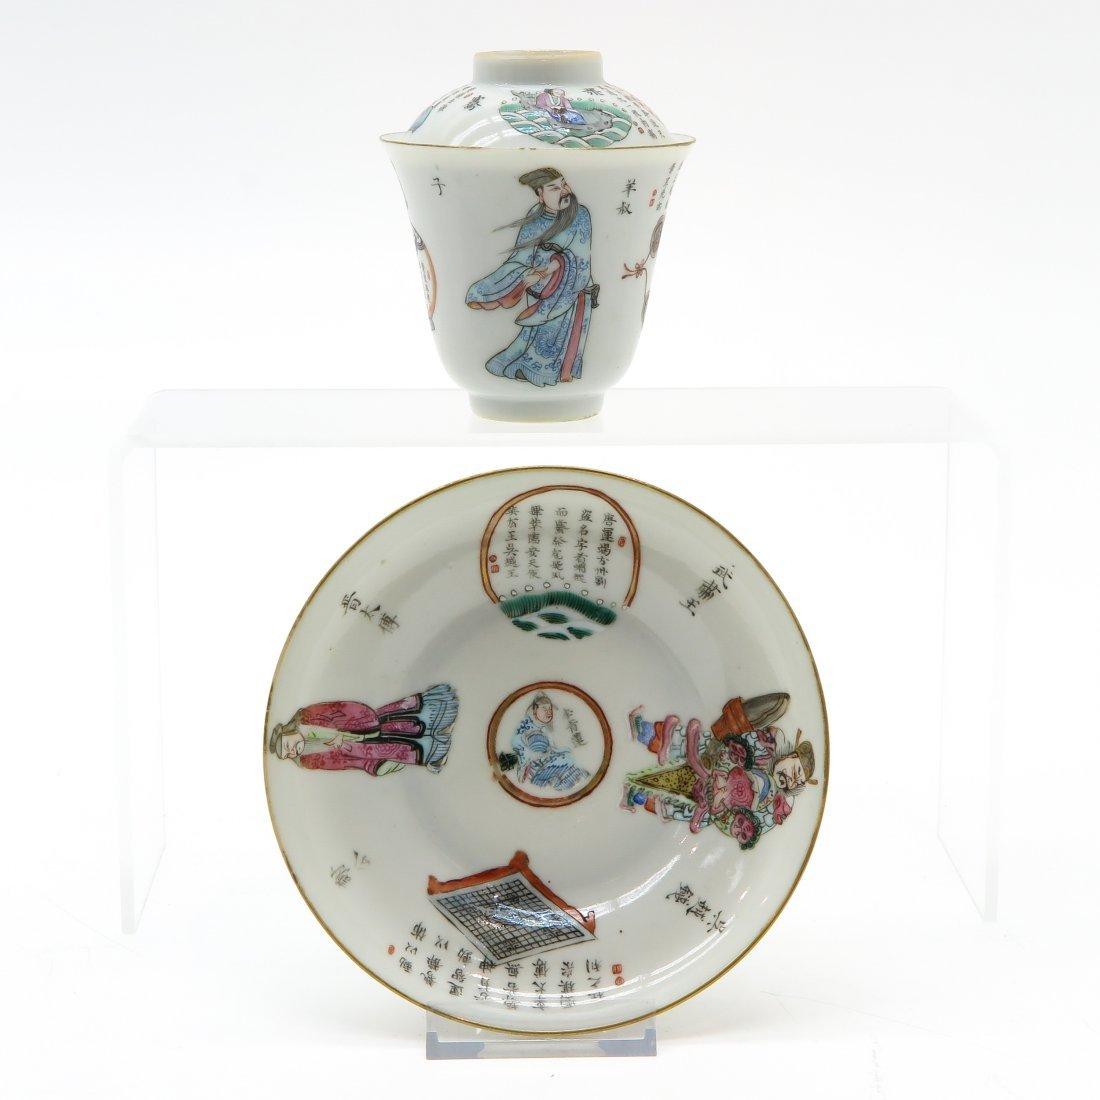 China Porcelain Wu Shuang Pu Decor Lidded Cup & Saucer